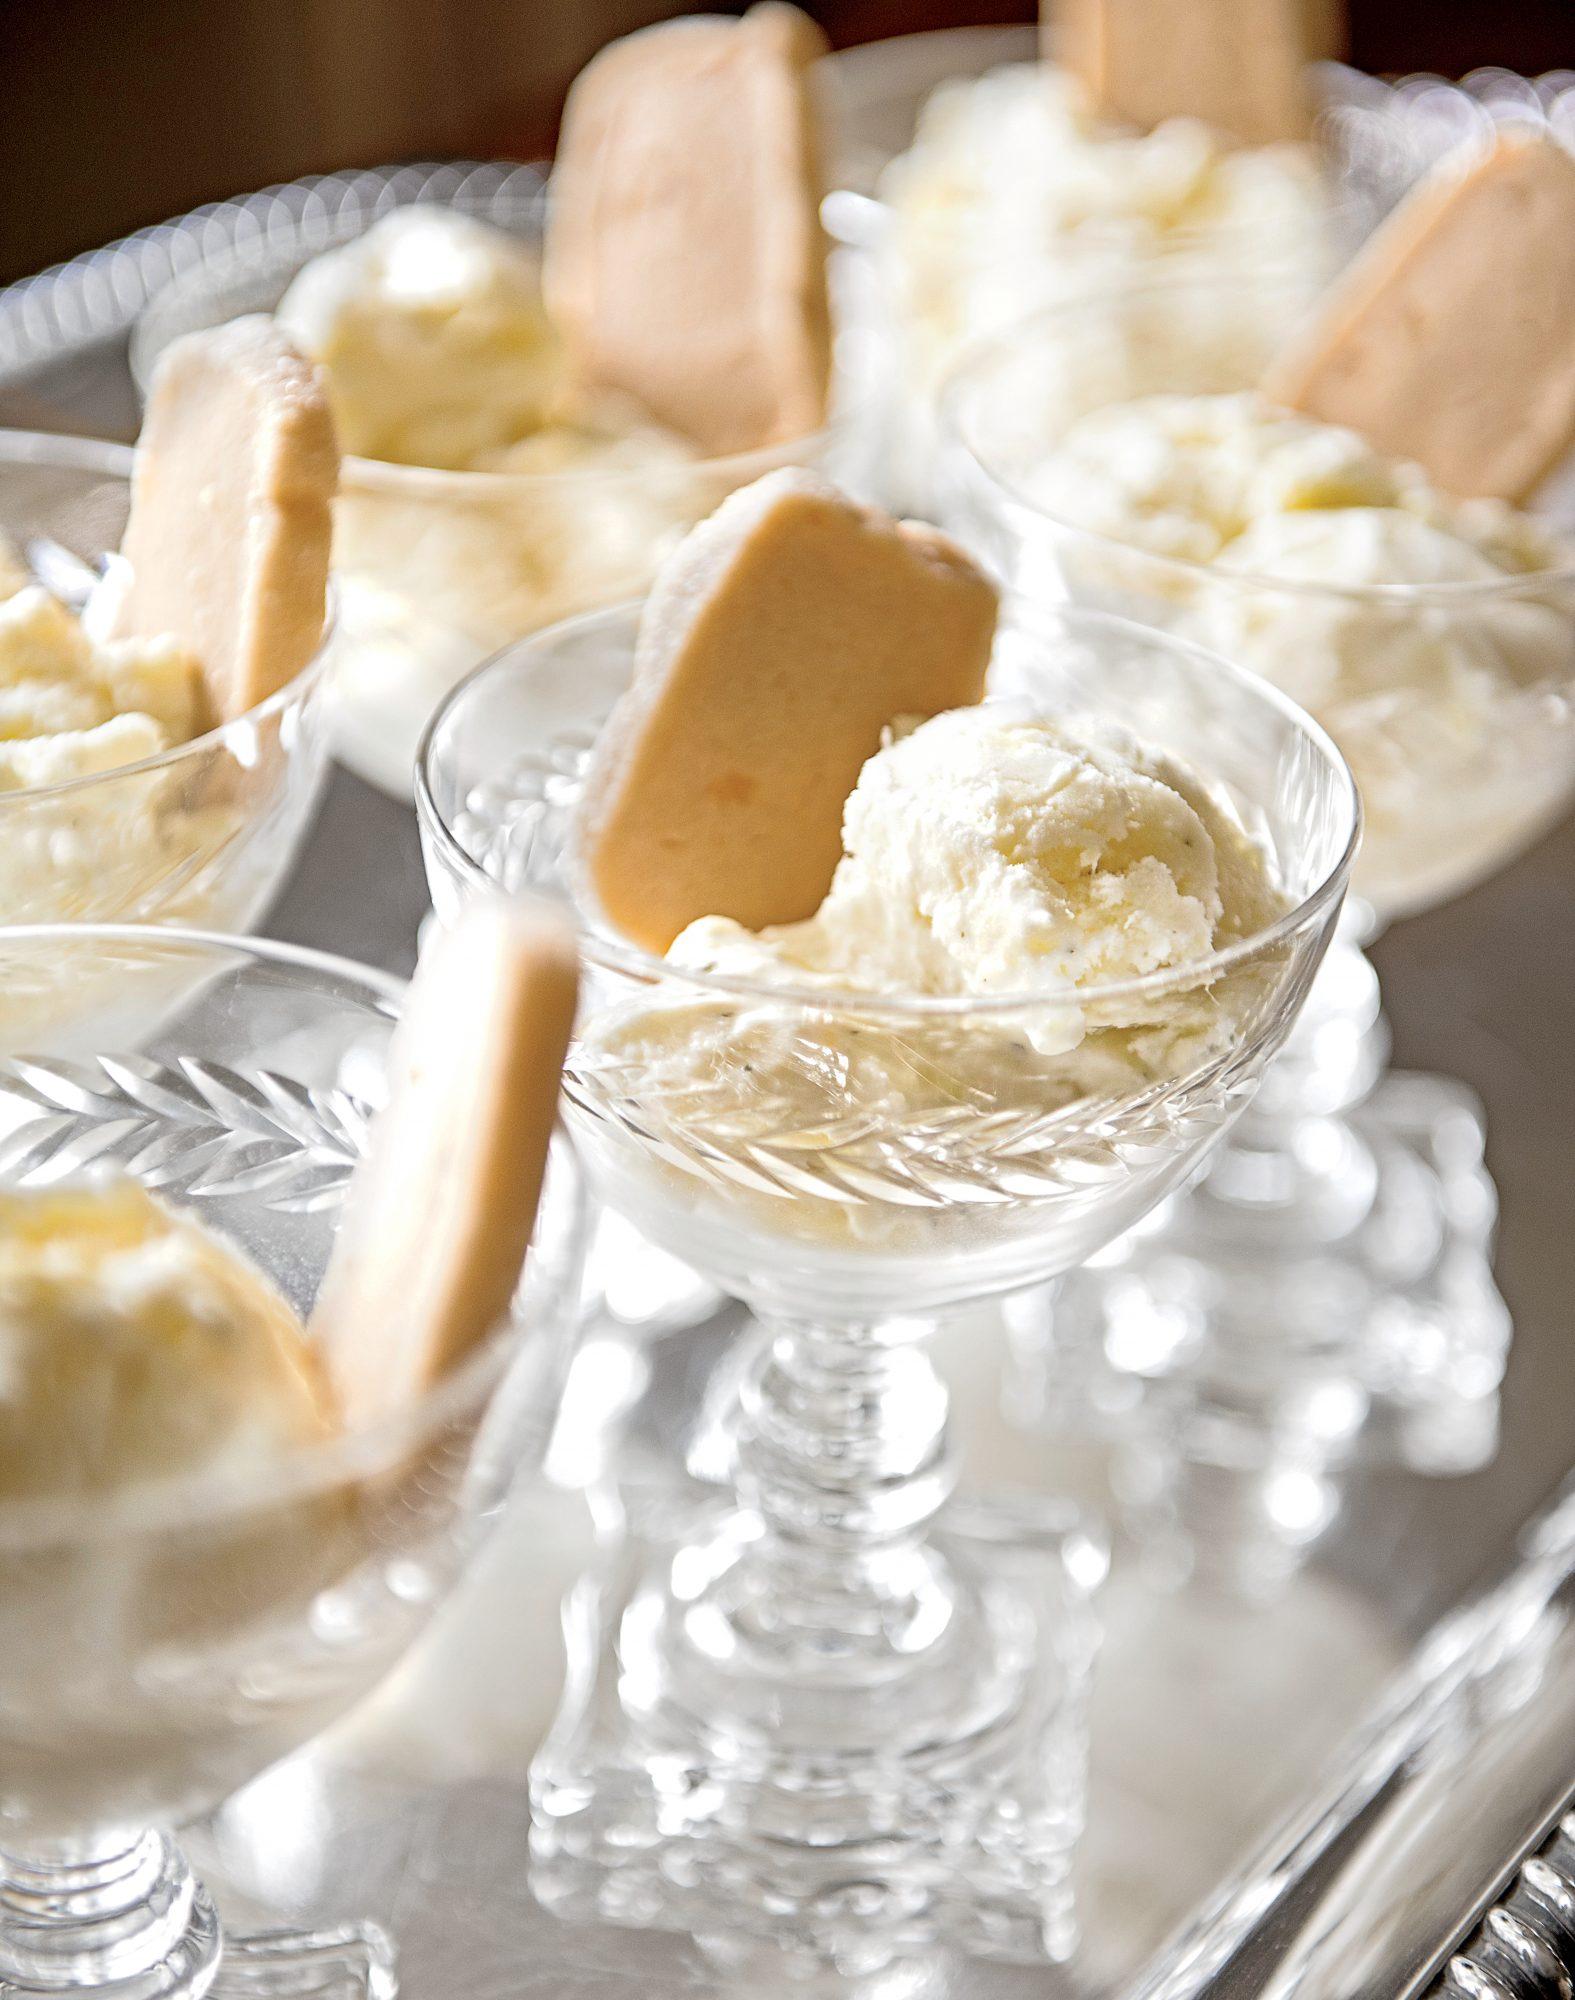 Justine's Pineapple-Mint Ice Cream